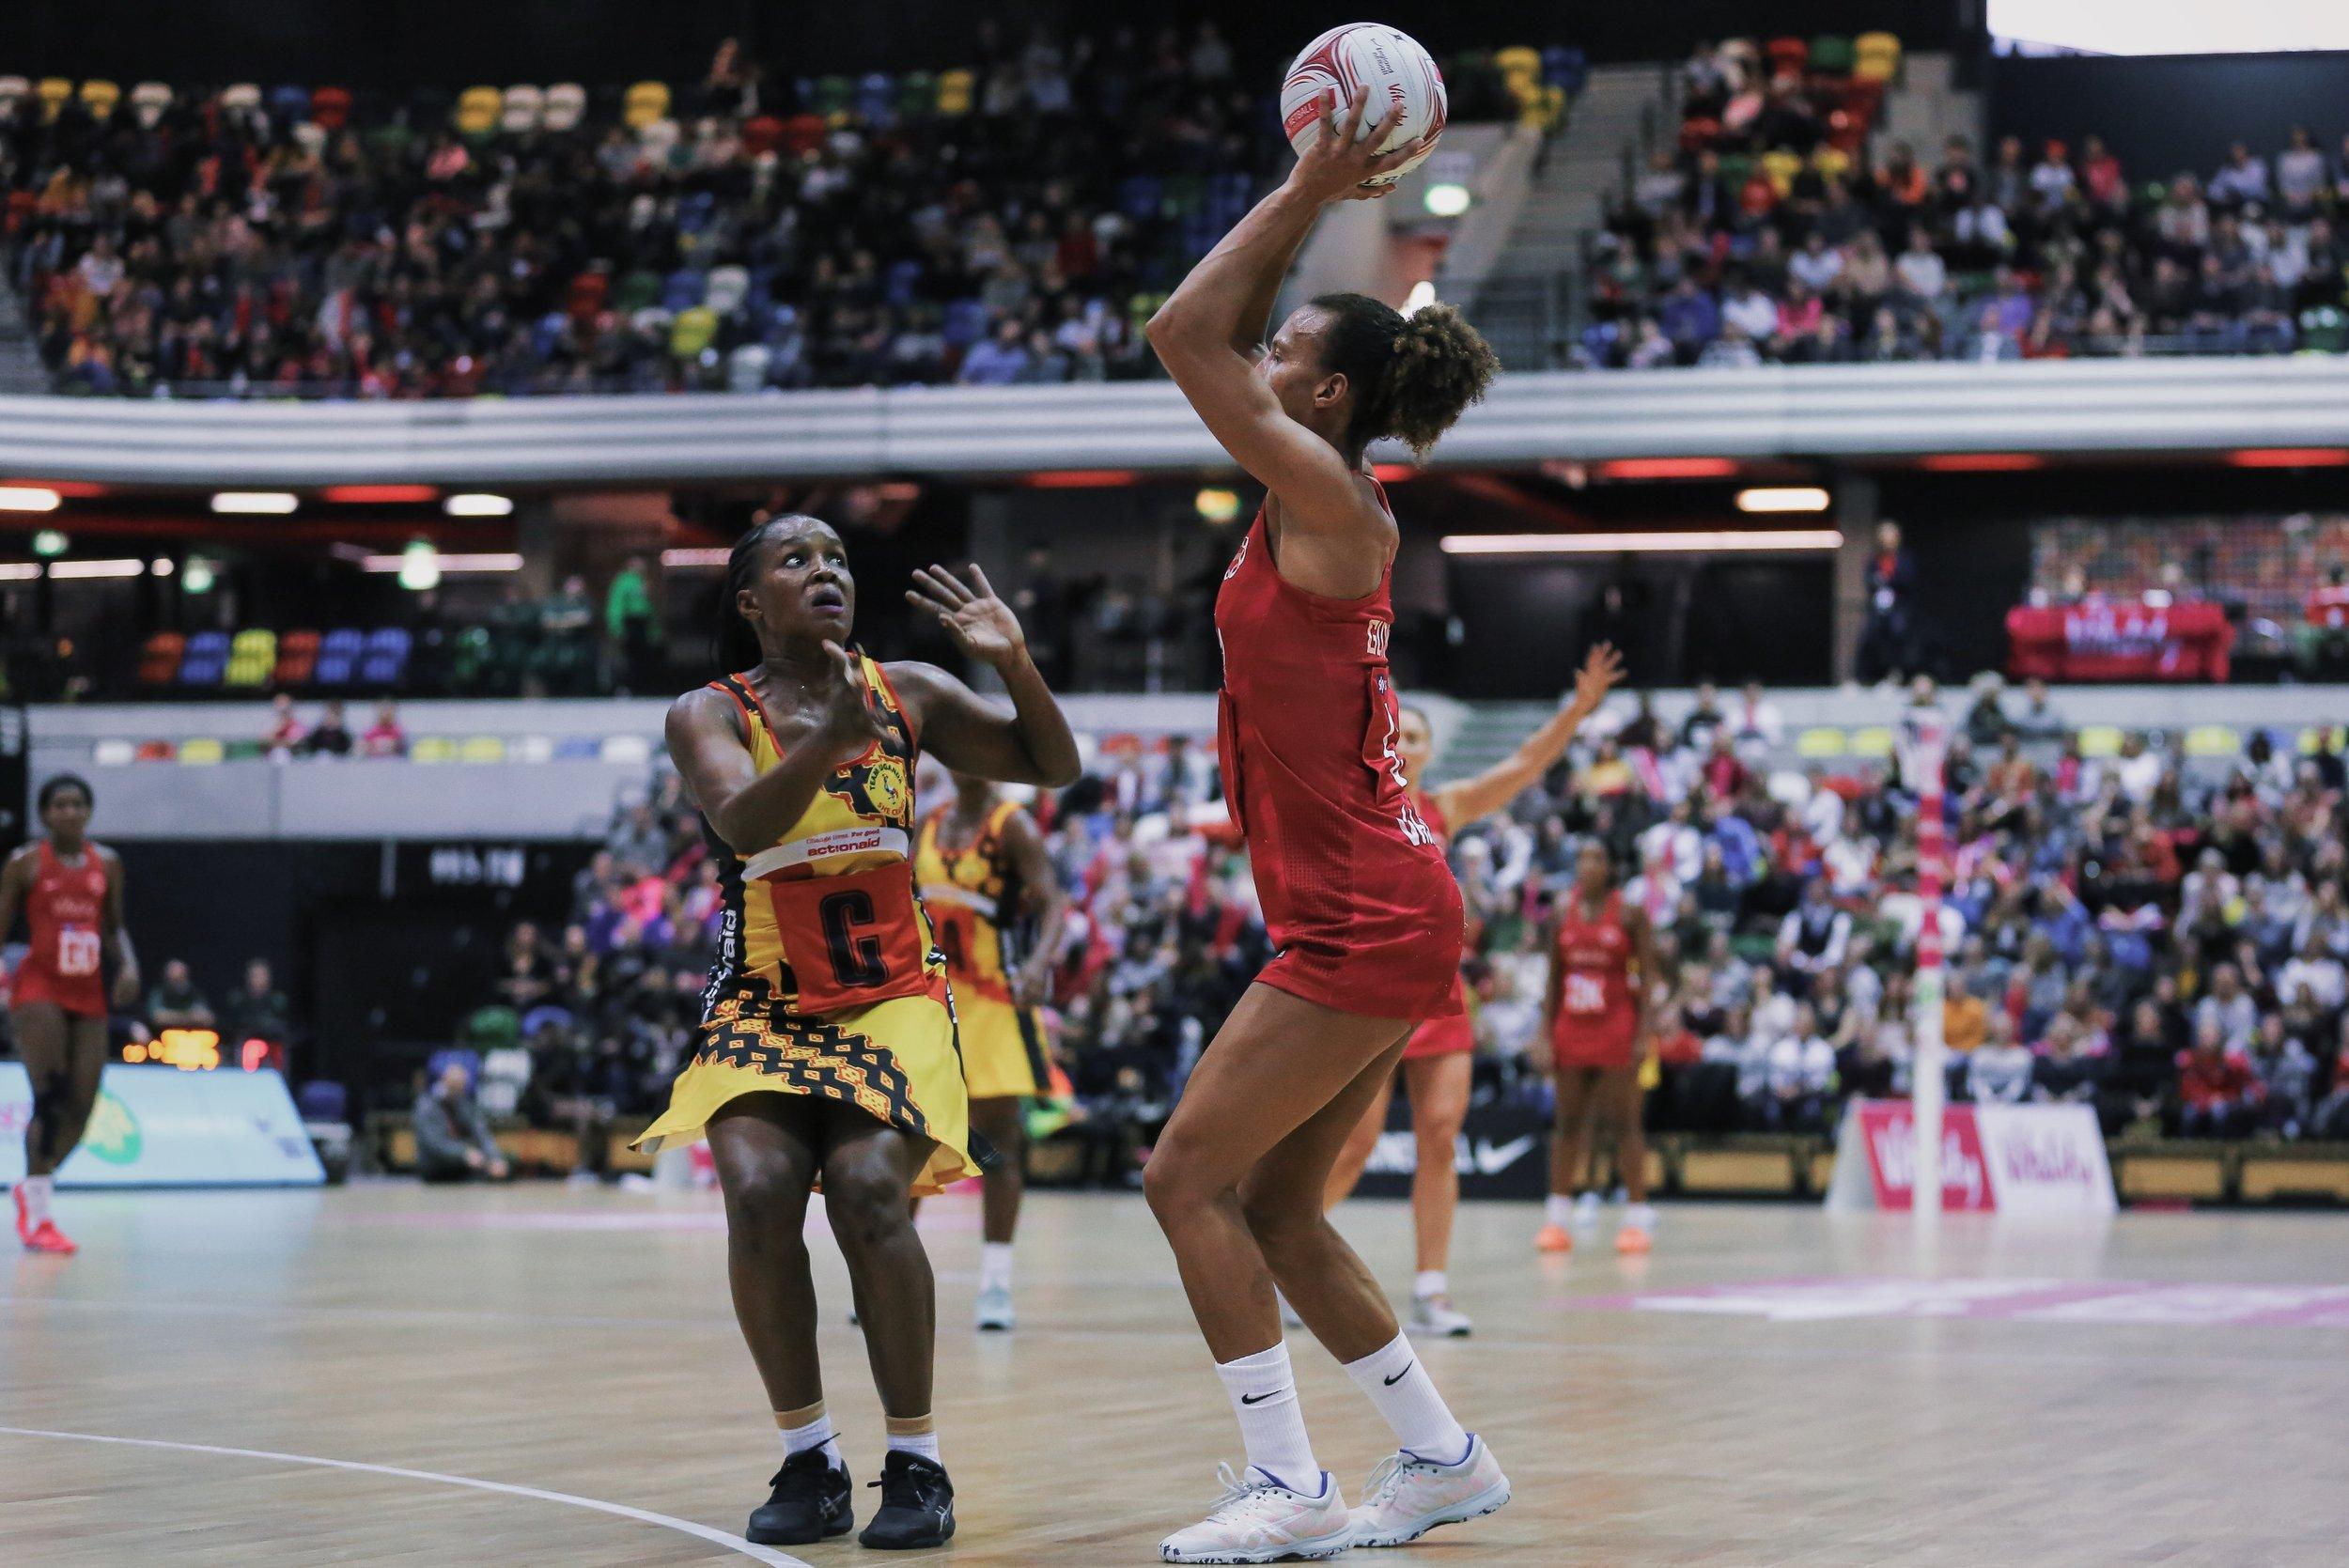 womens-netball-sport-england-uganda-international-series-16.jpg